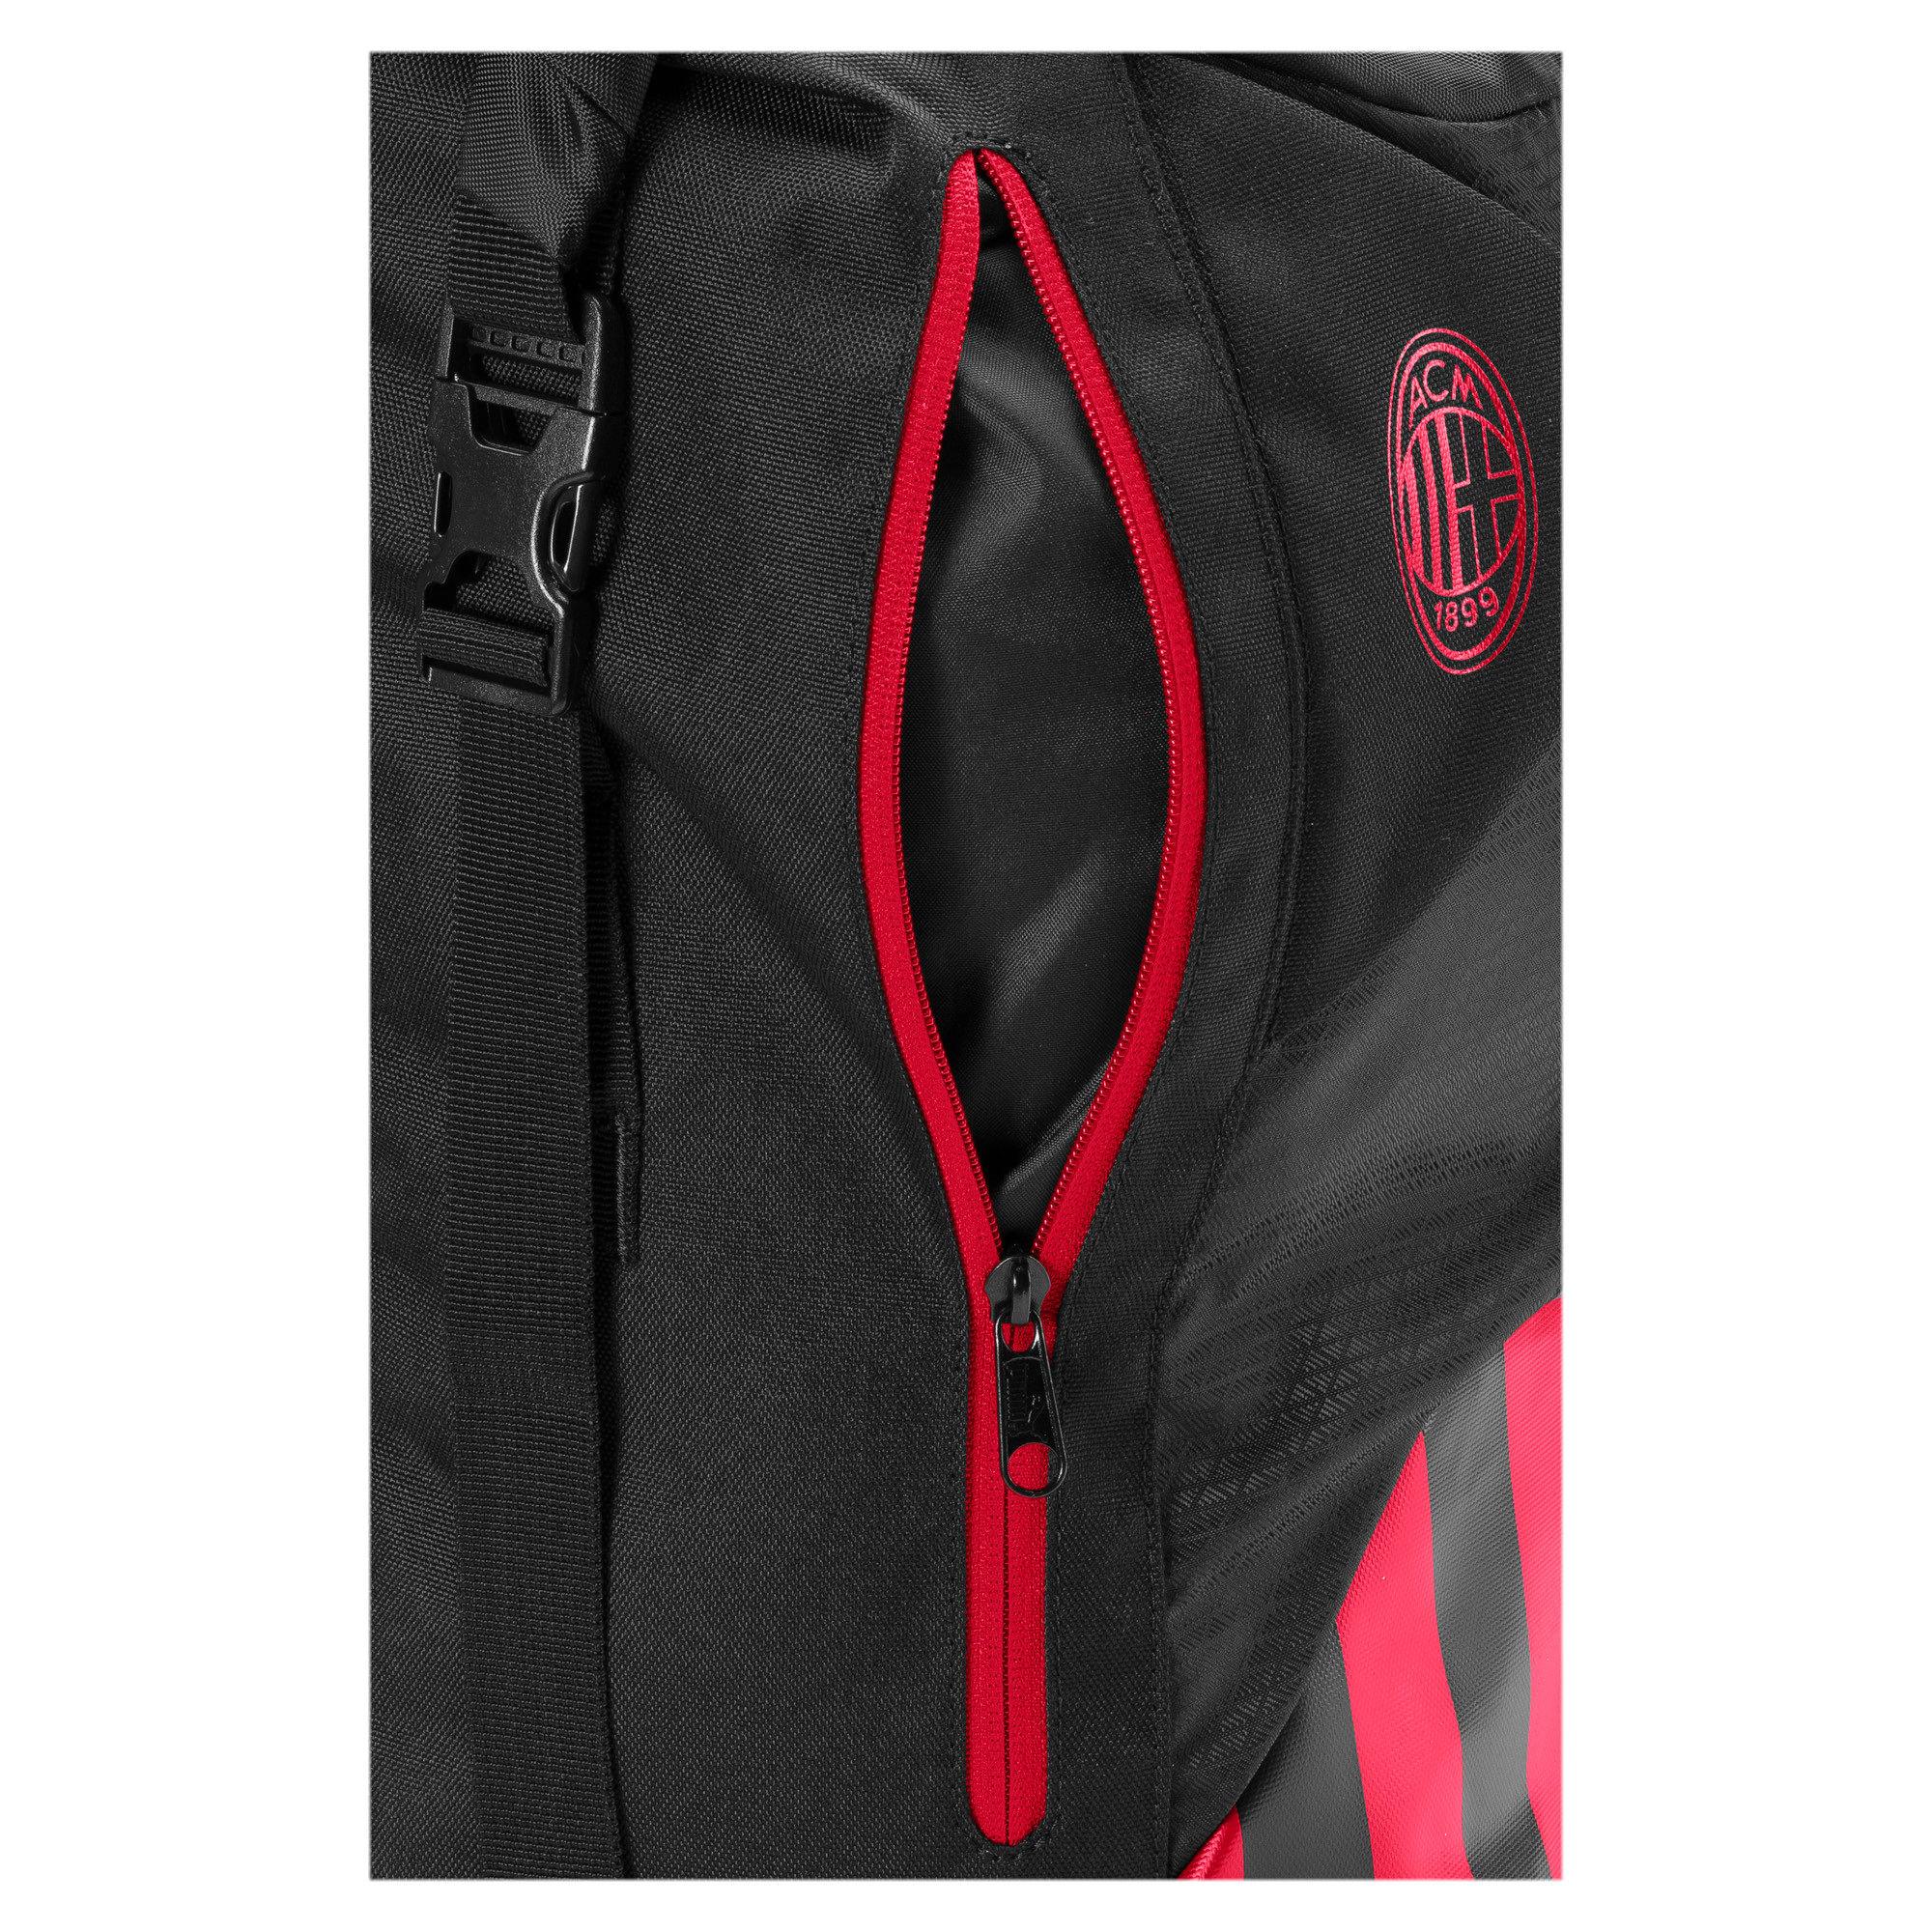 Thumbnail 3 of AC Milan Football Culture Rolltop Backpack, Puma Black-Tango Red, medium